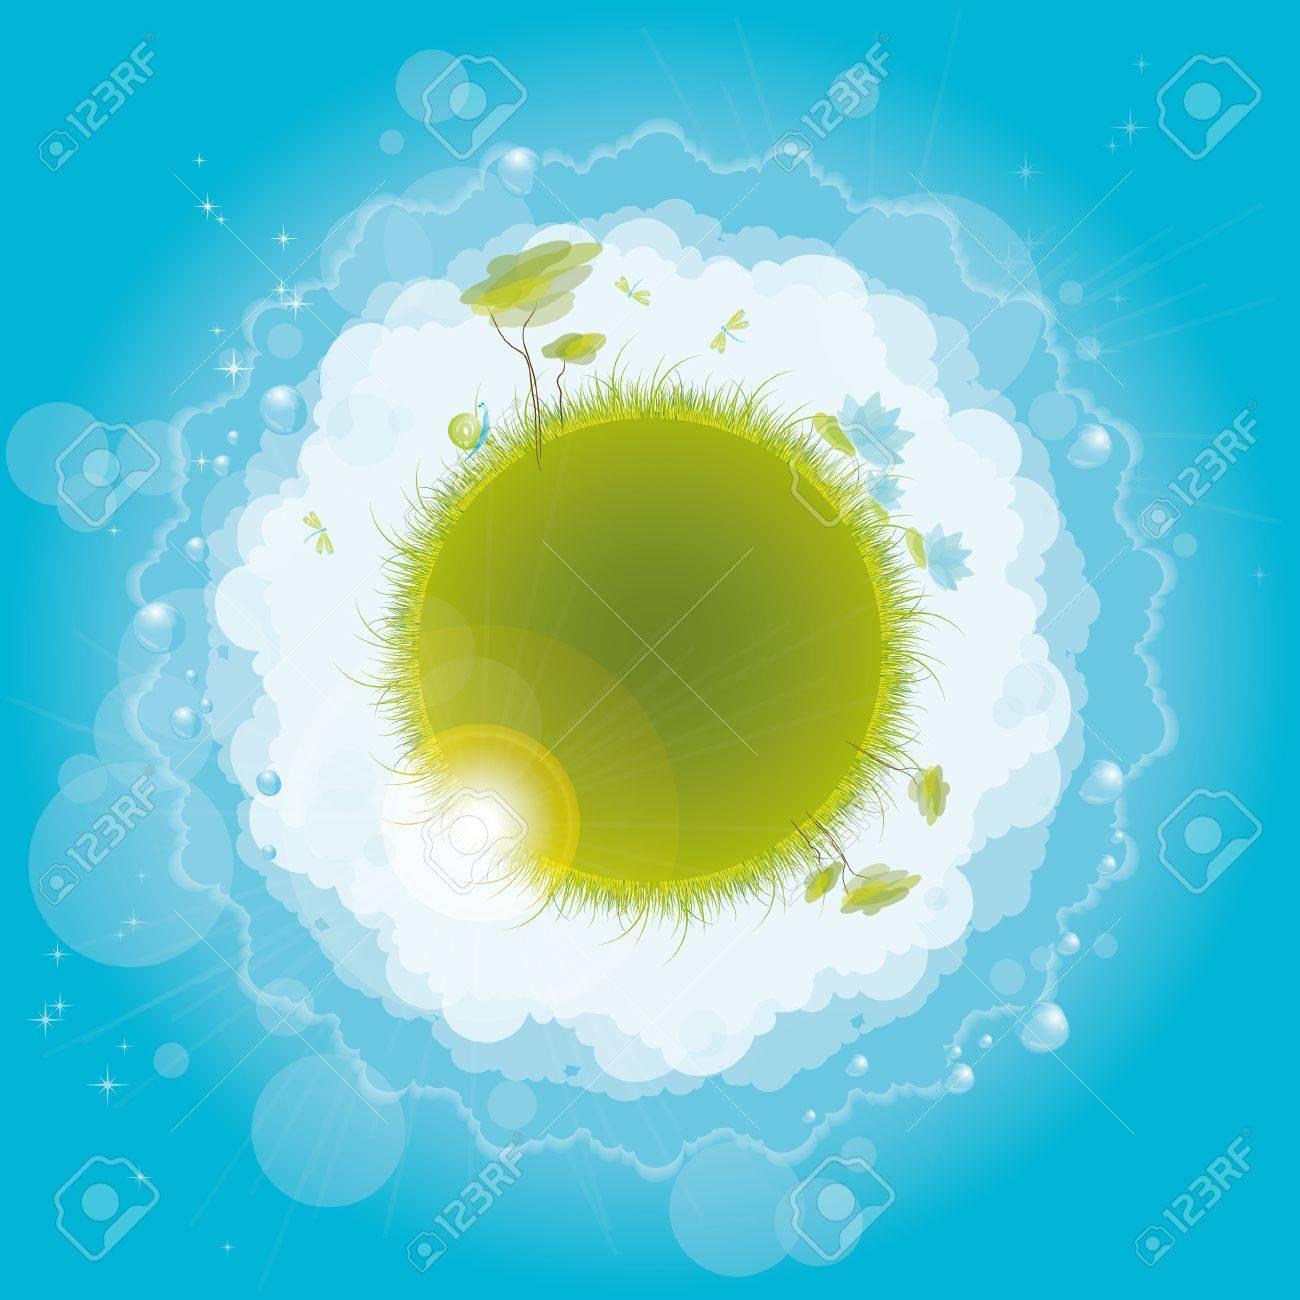 Round nature design, vector illustration, eps-10 Stock Vector - 9362481